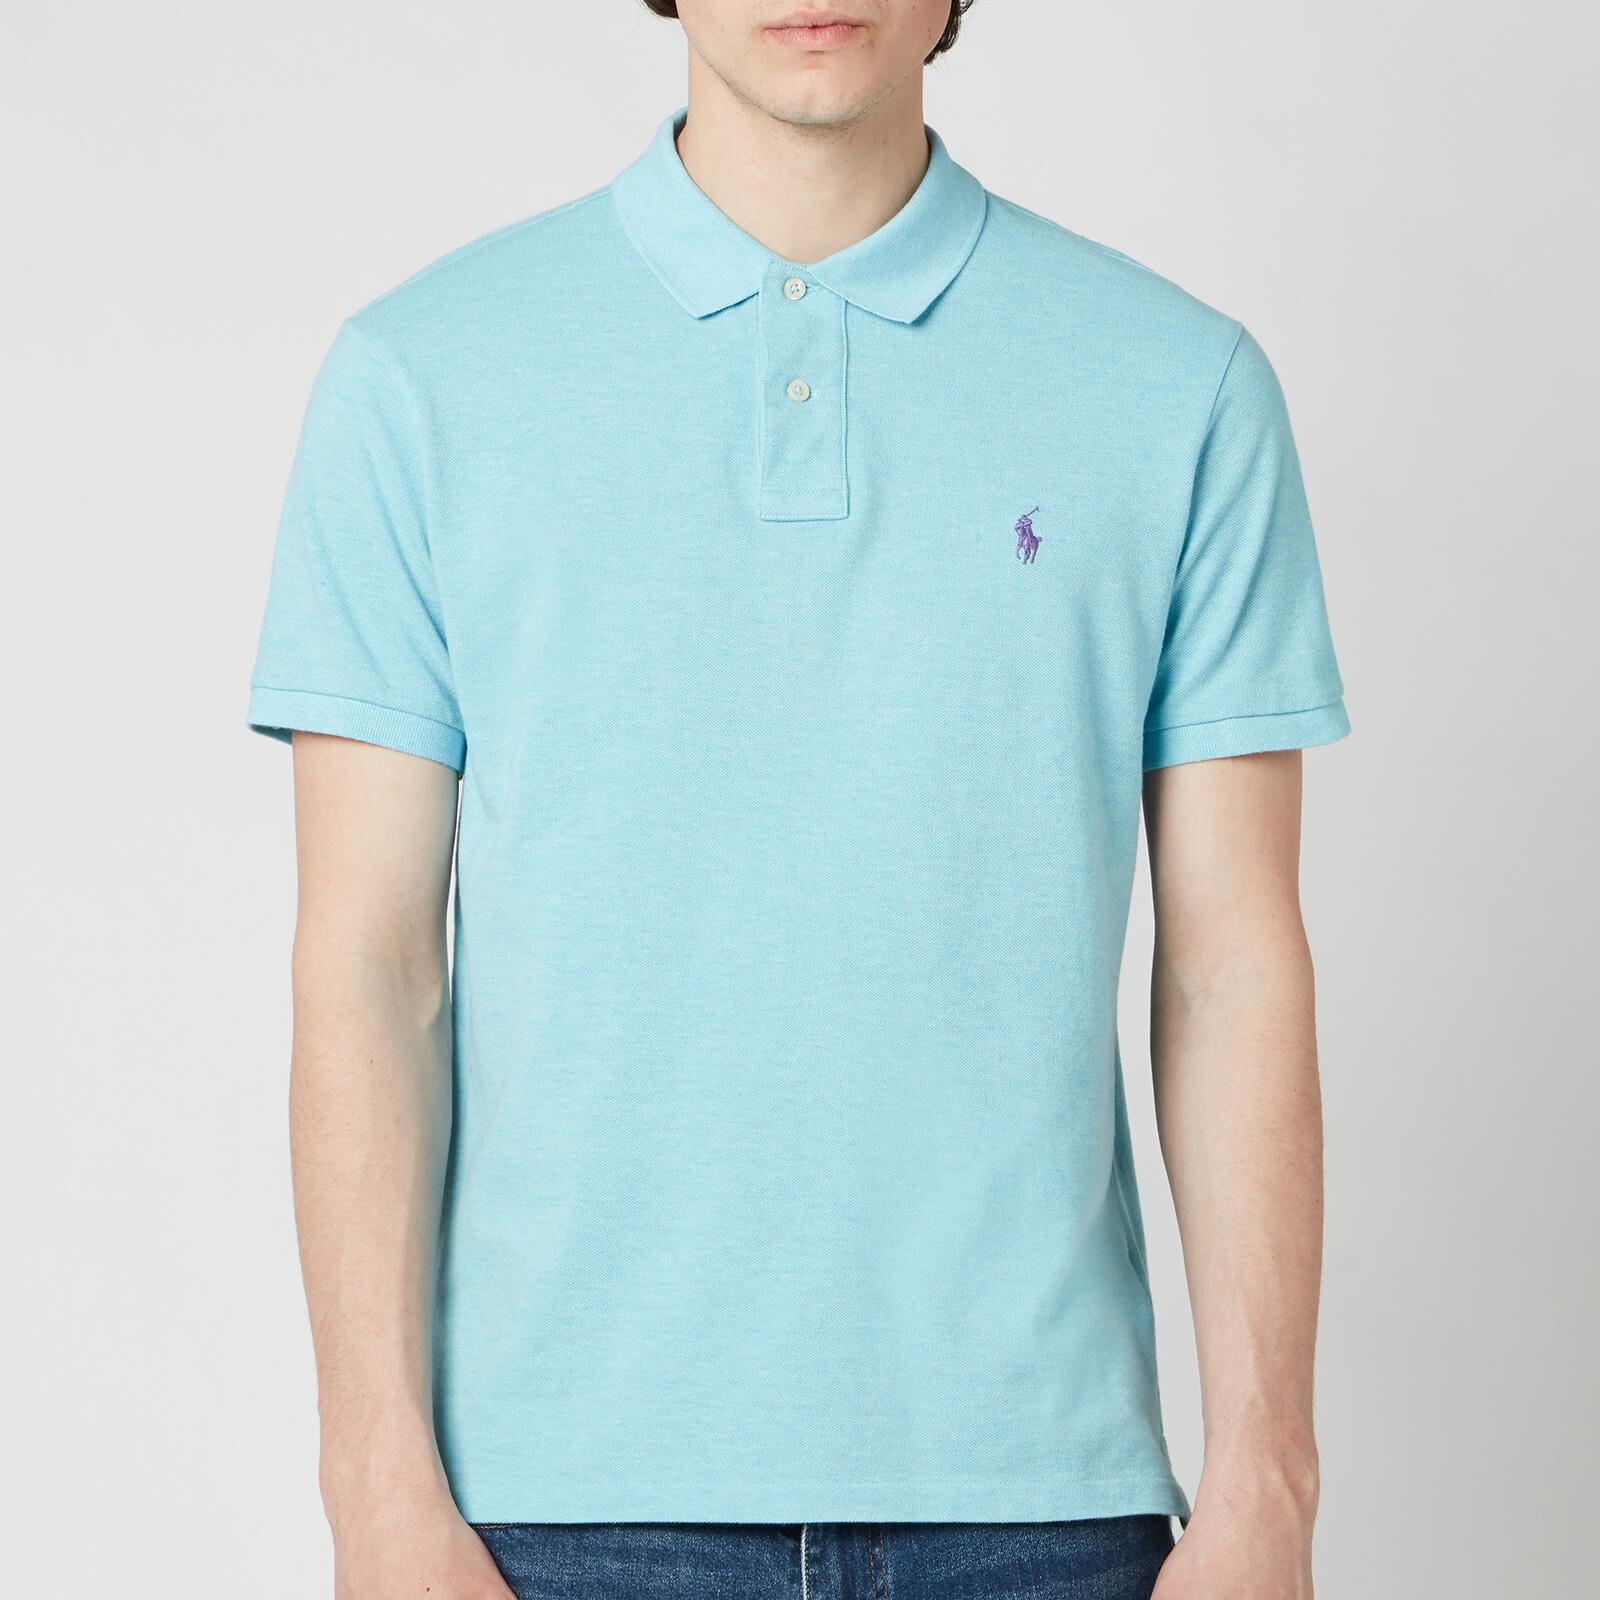 Polo Ralph Lauren Men's Mesh Knit Slim Fit Polo Shirt - Watchhill Blue Heather - S